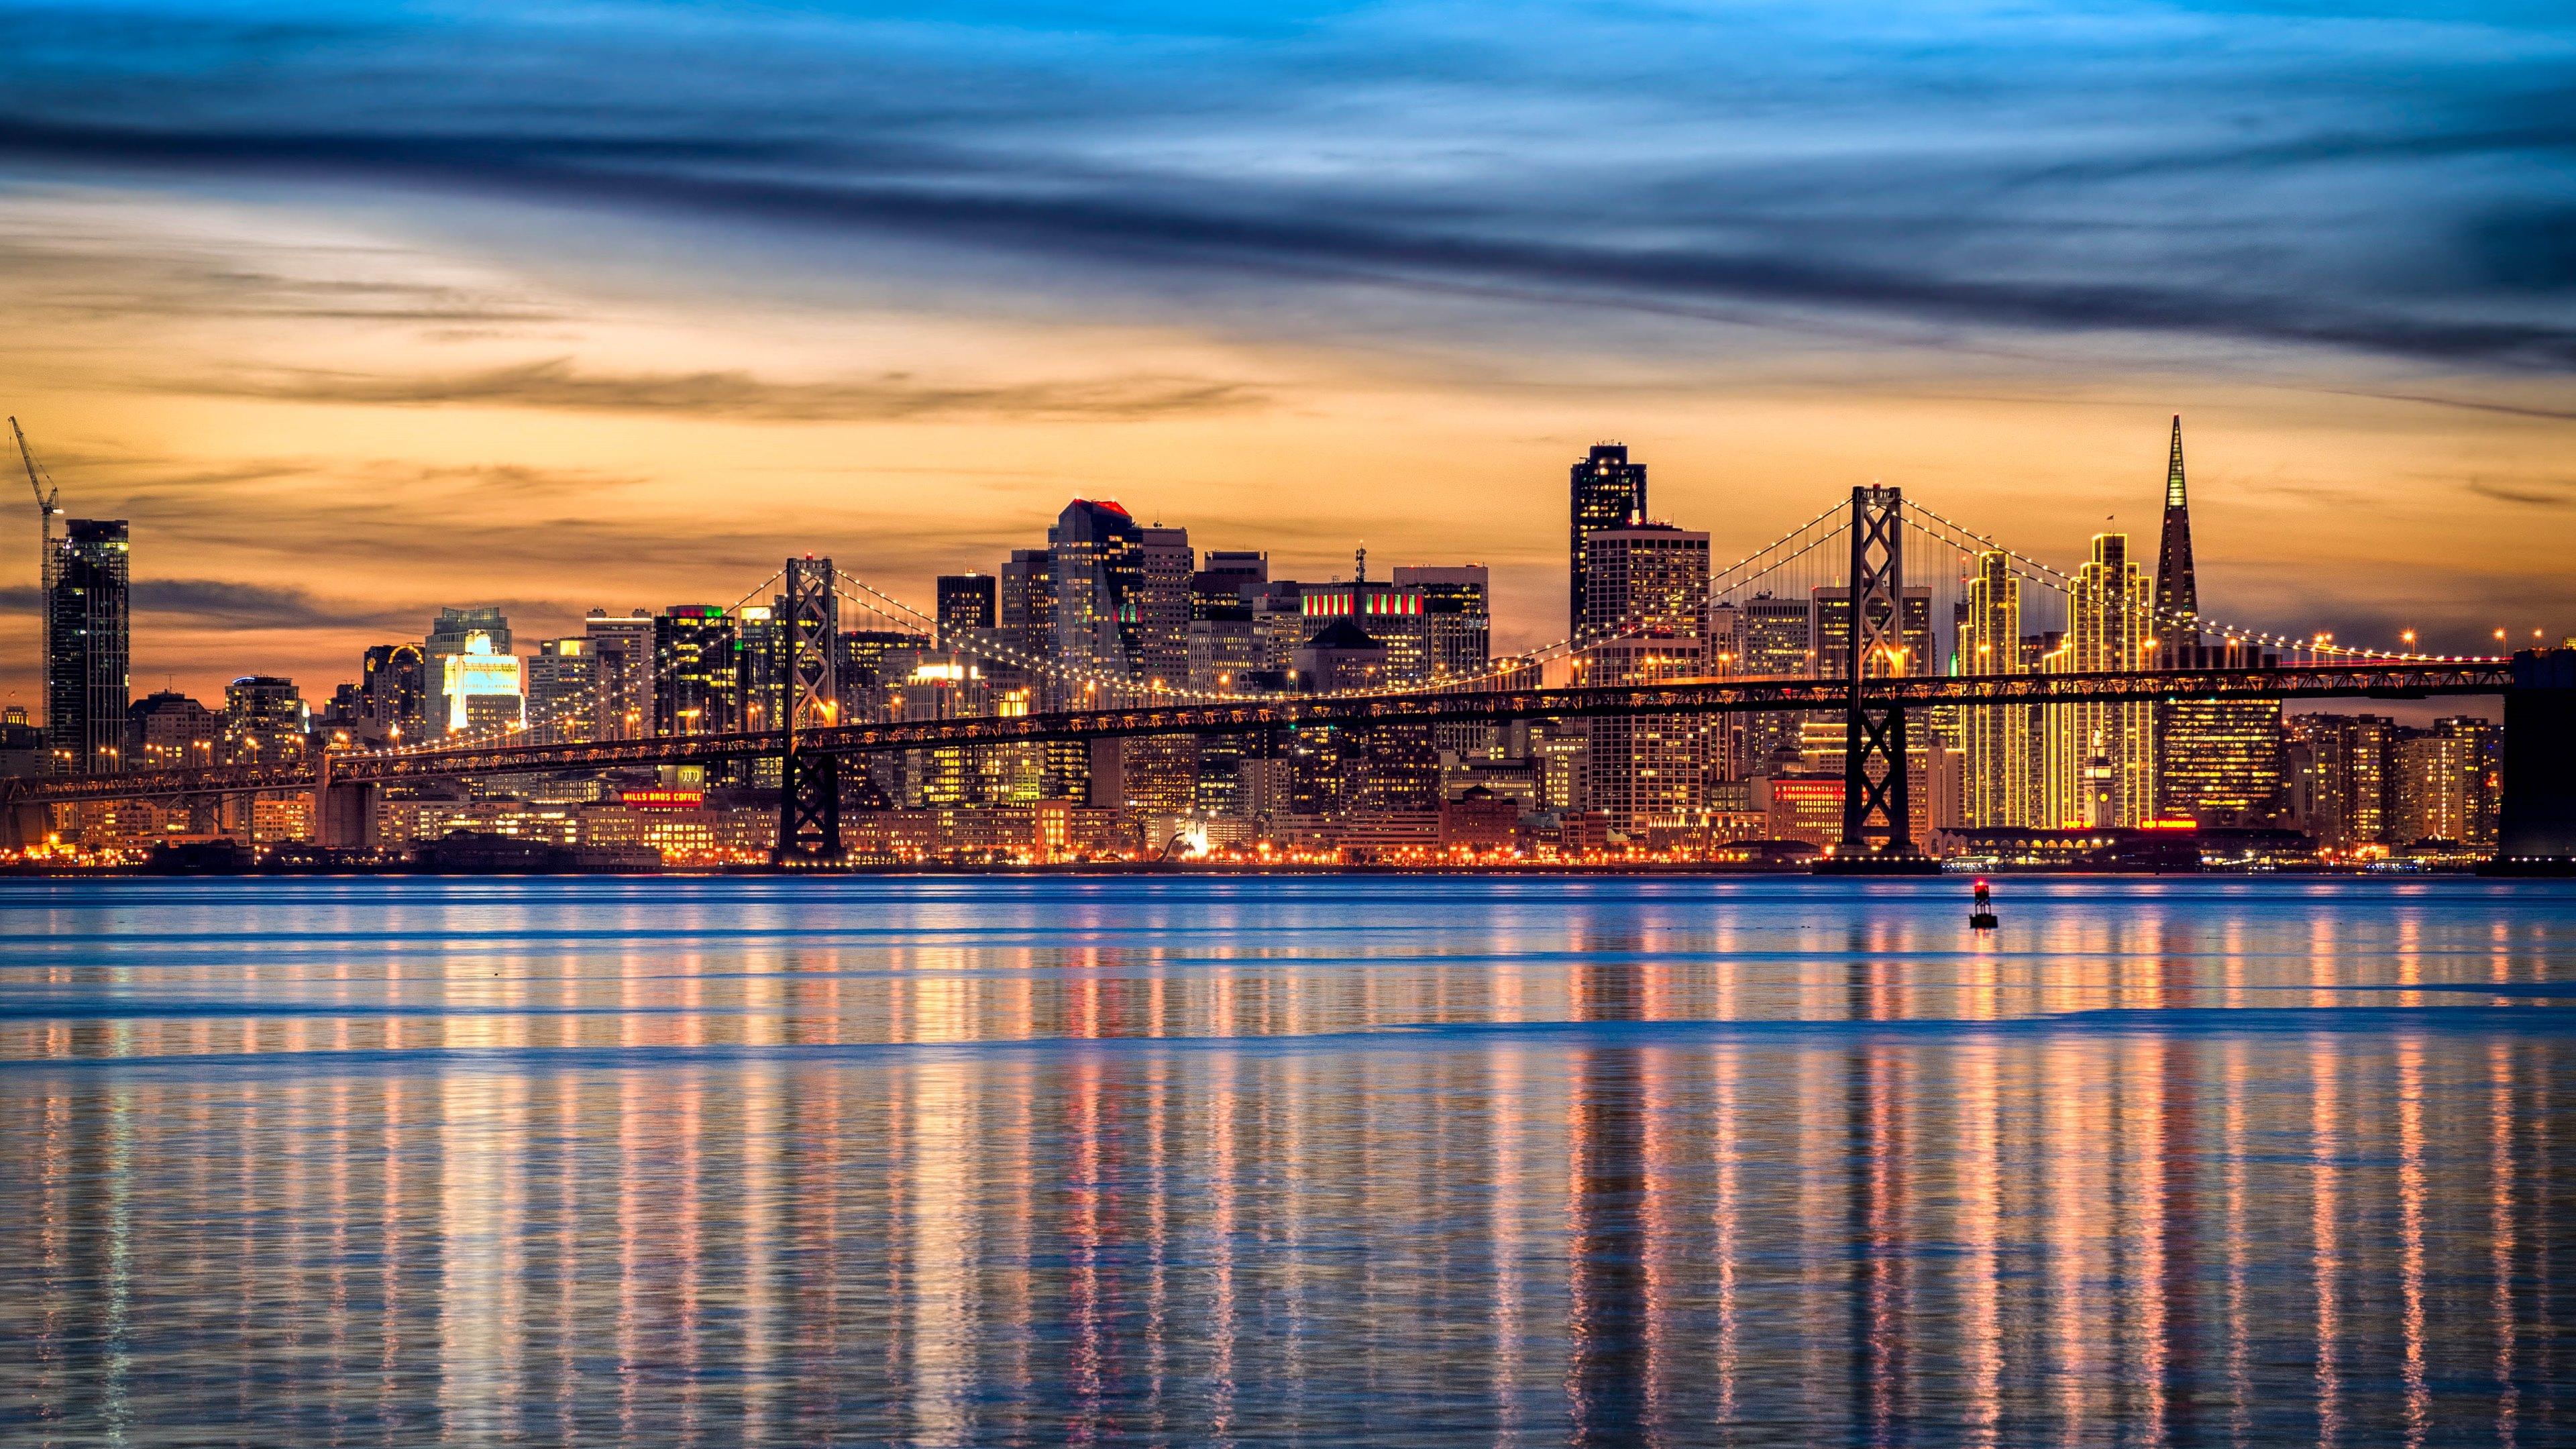 San Francisco Skyline wallpaper.